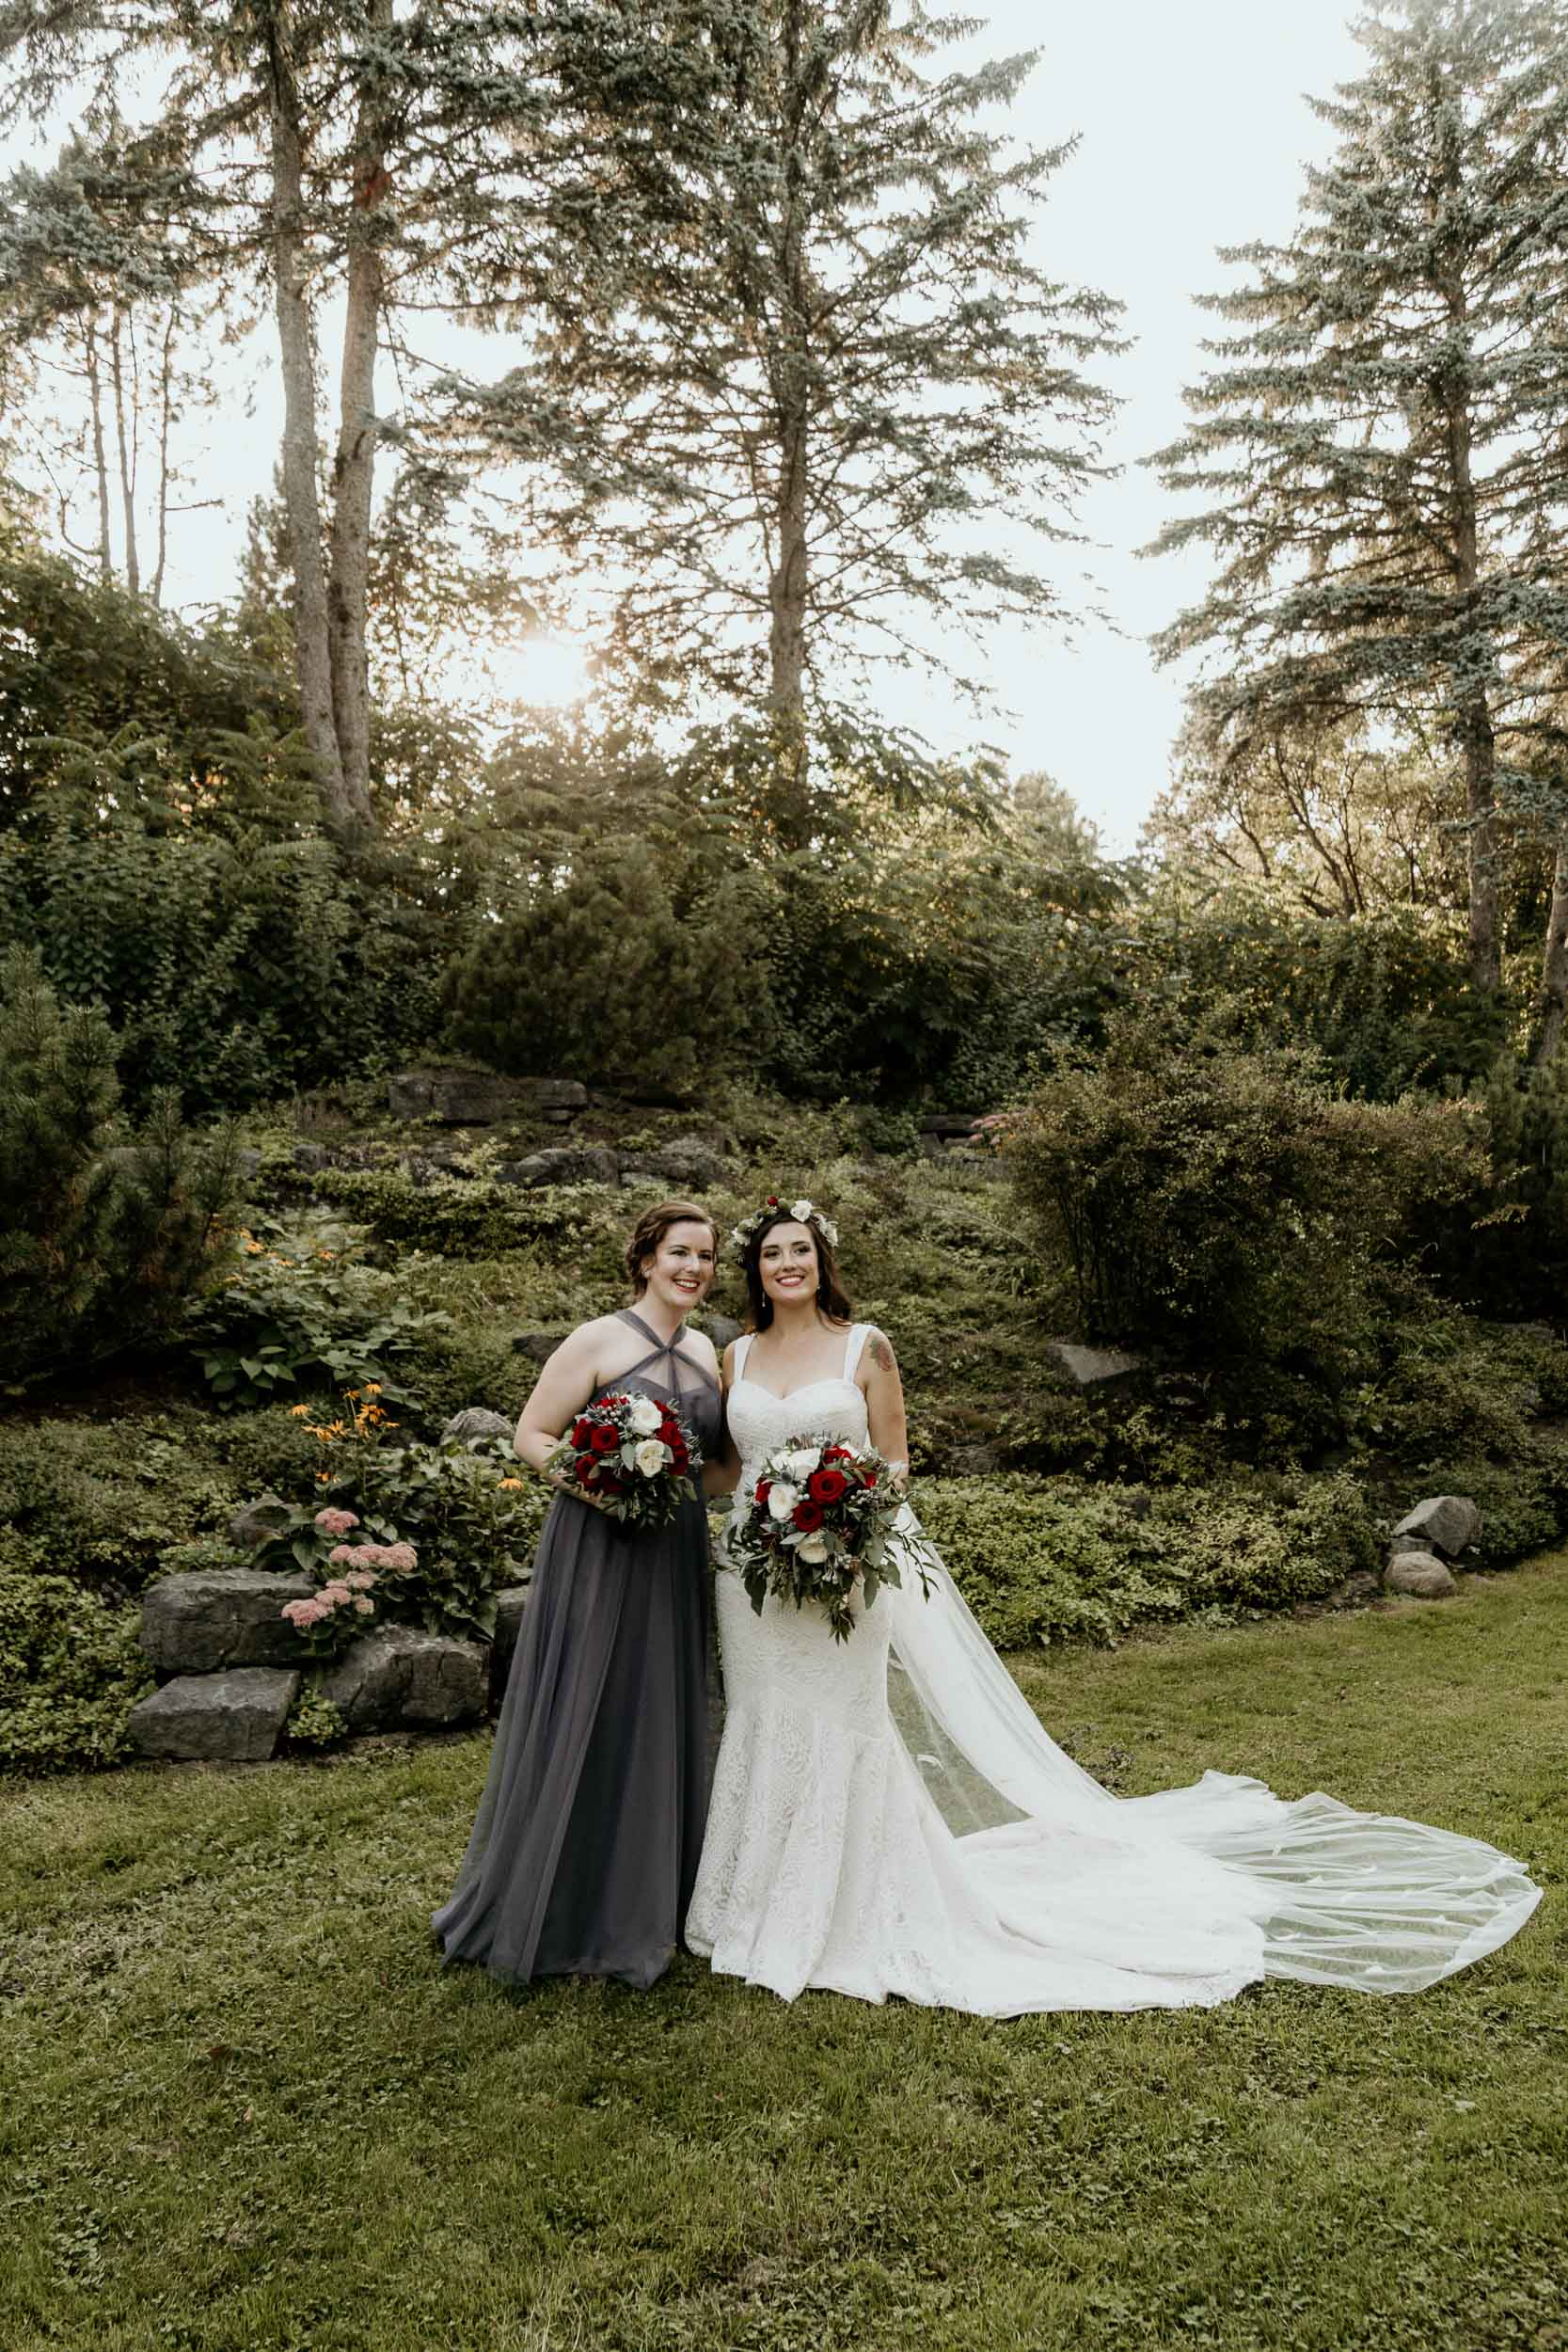 intimate-wedding-elopement-photographer-ottawa-toronto-7541.jpg